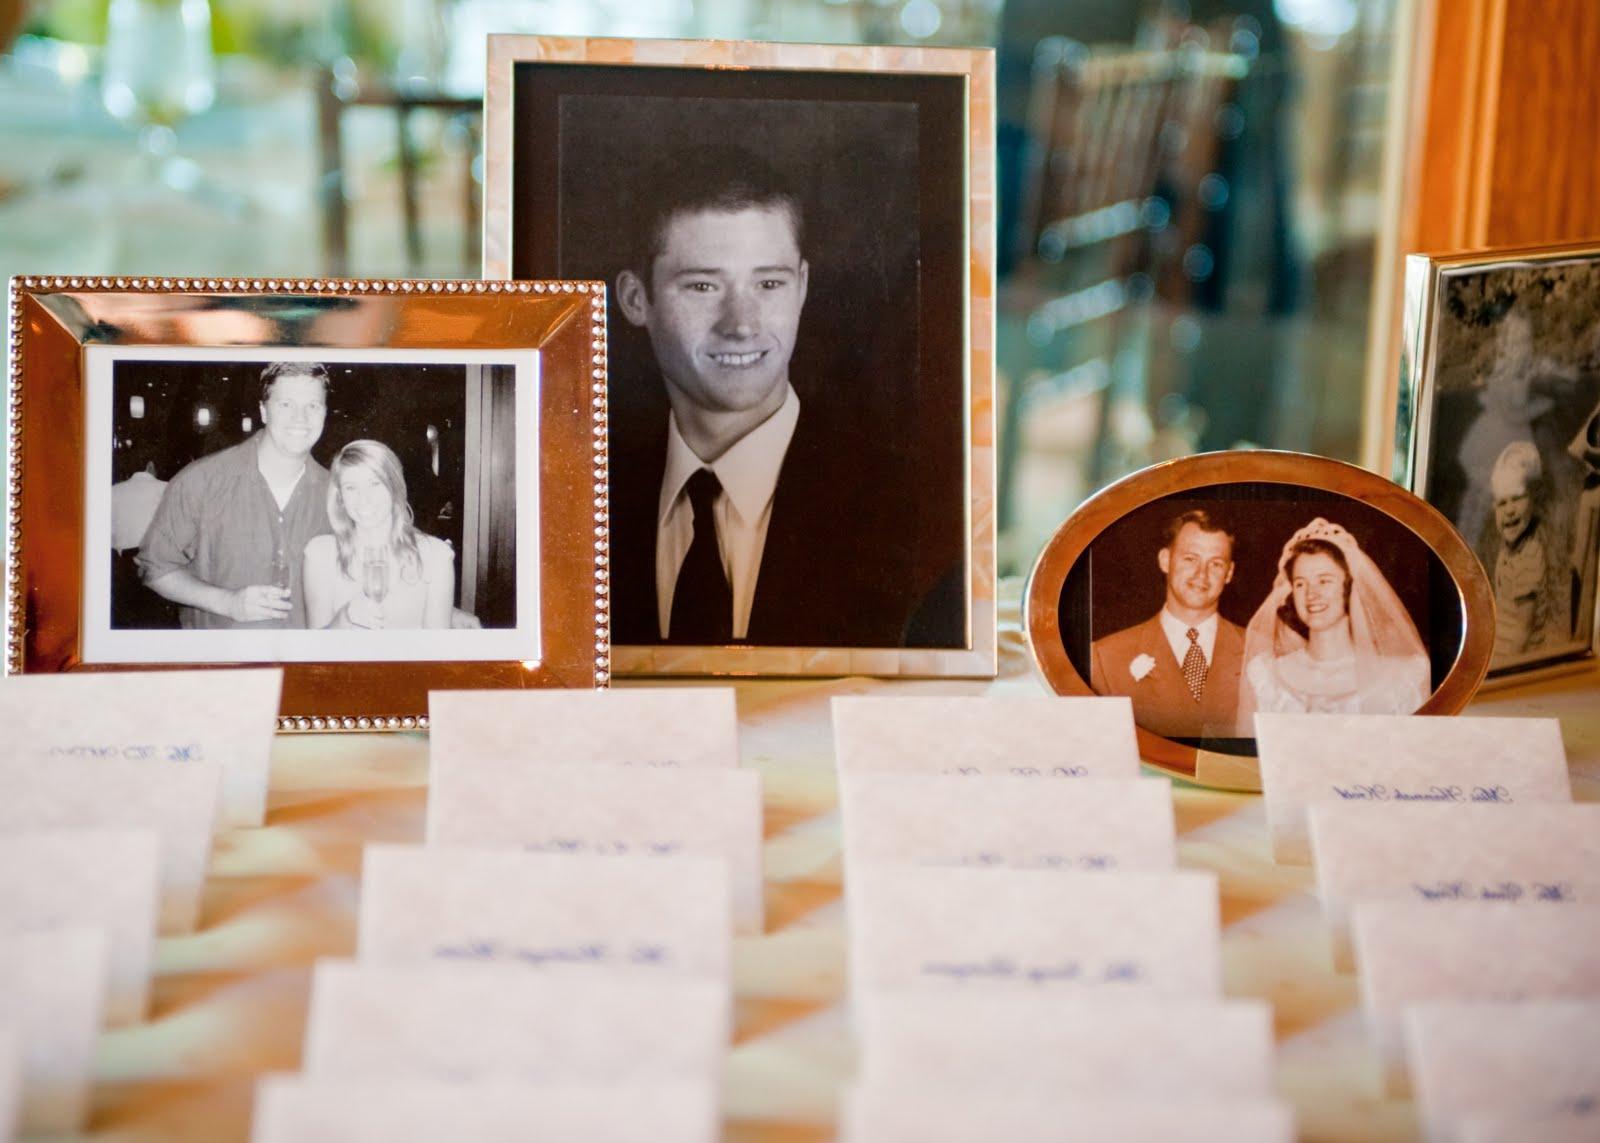 wedding day, 61 years ago!